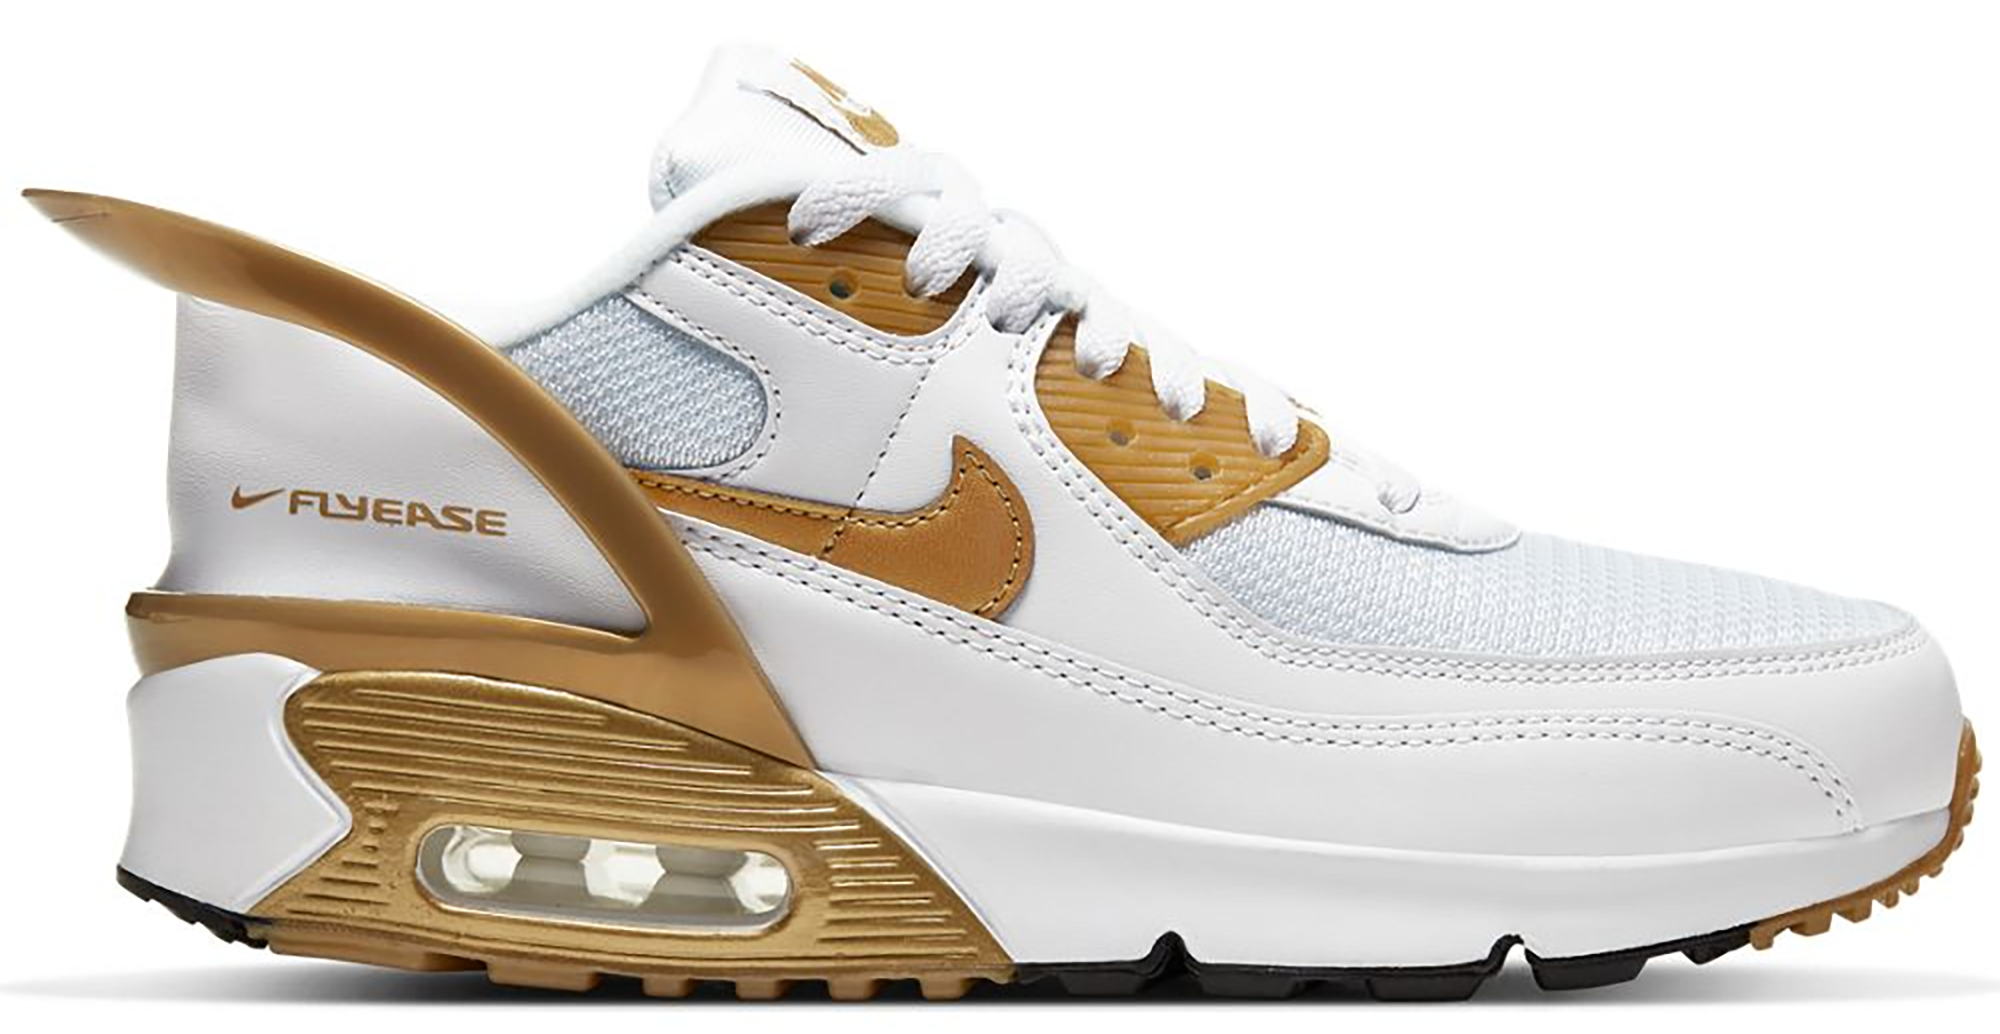 Nike Air Max 90 Flyease White Gold (GS